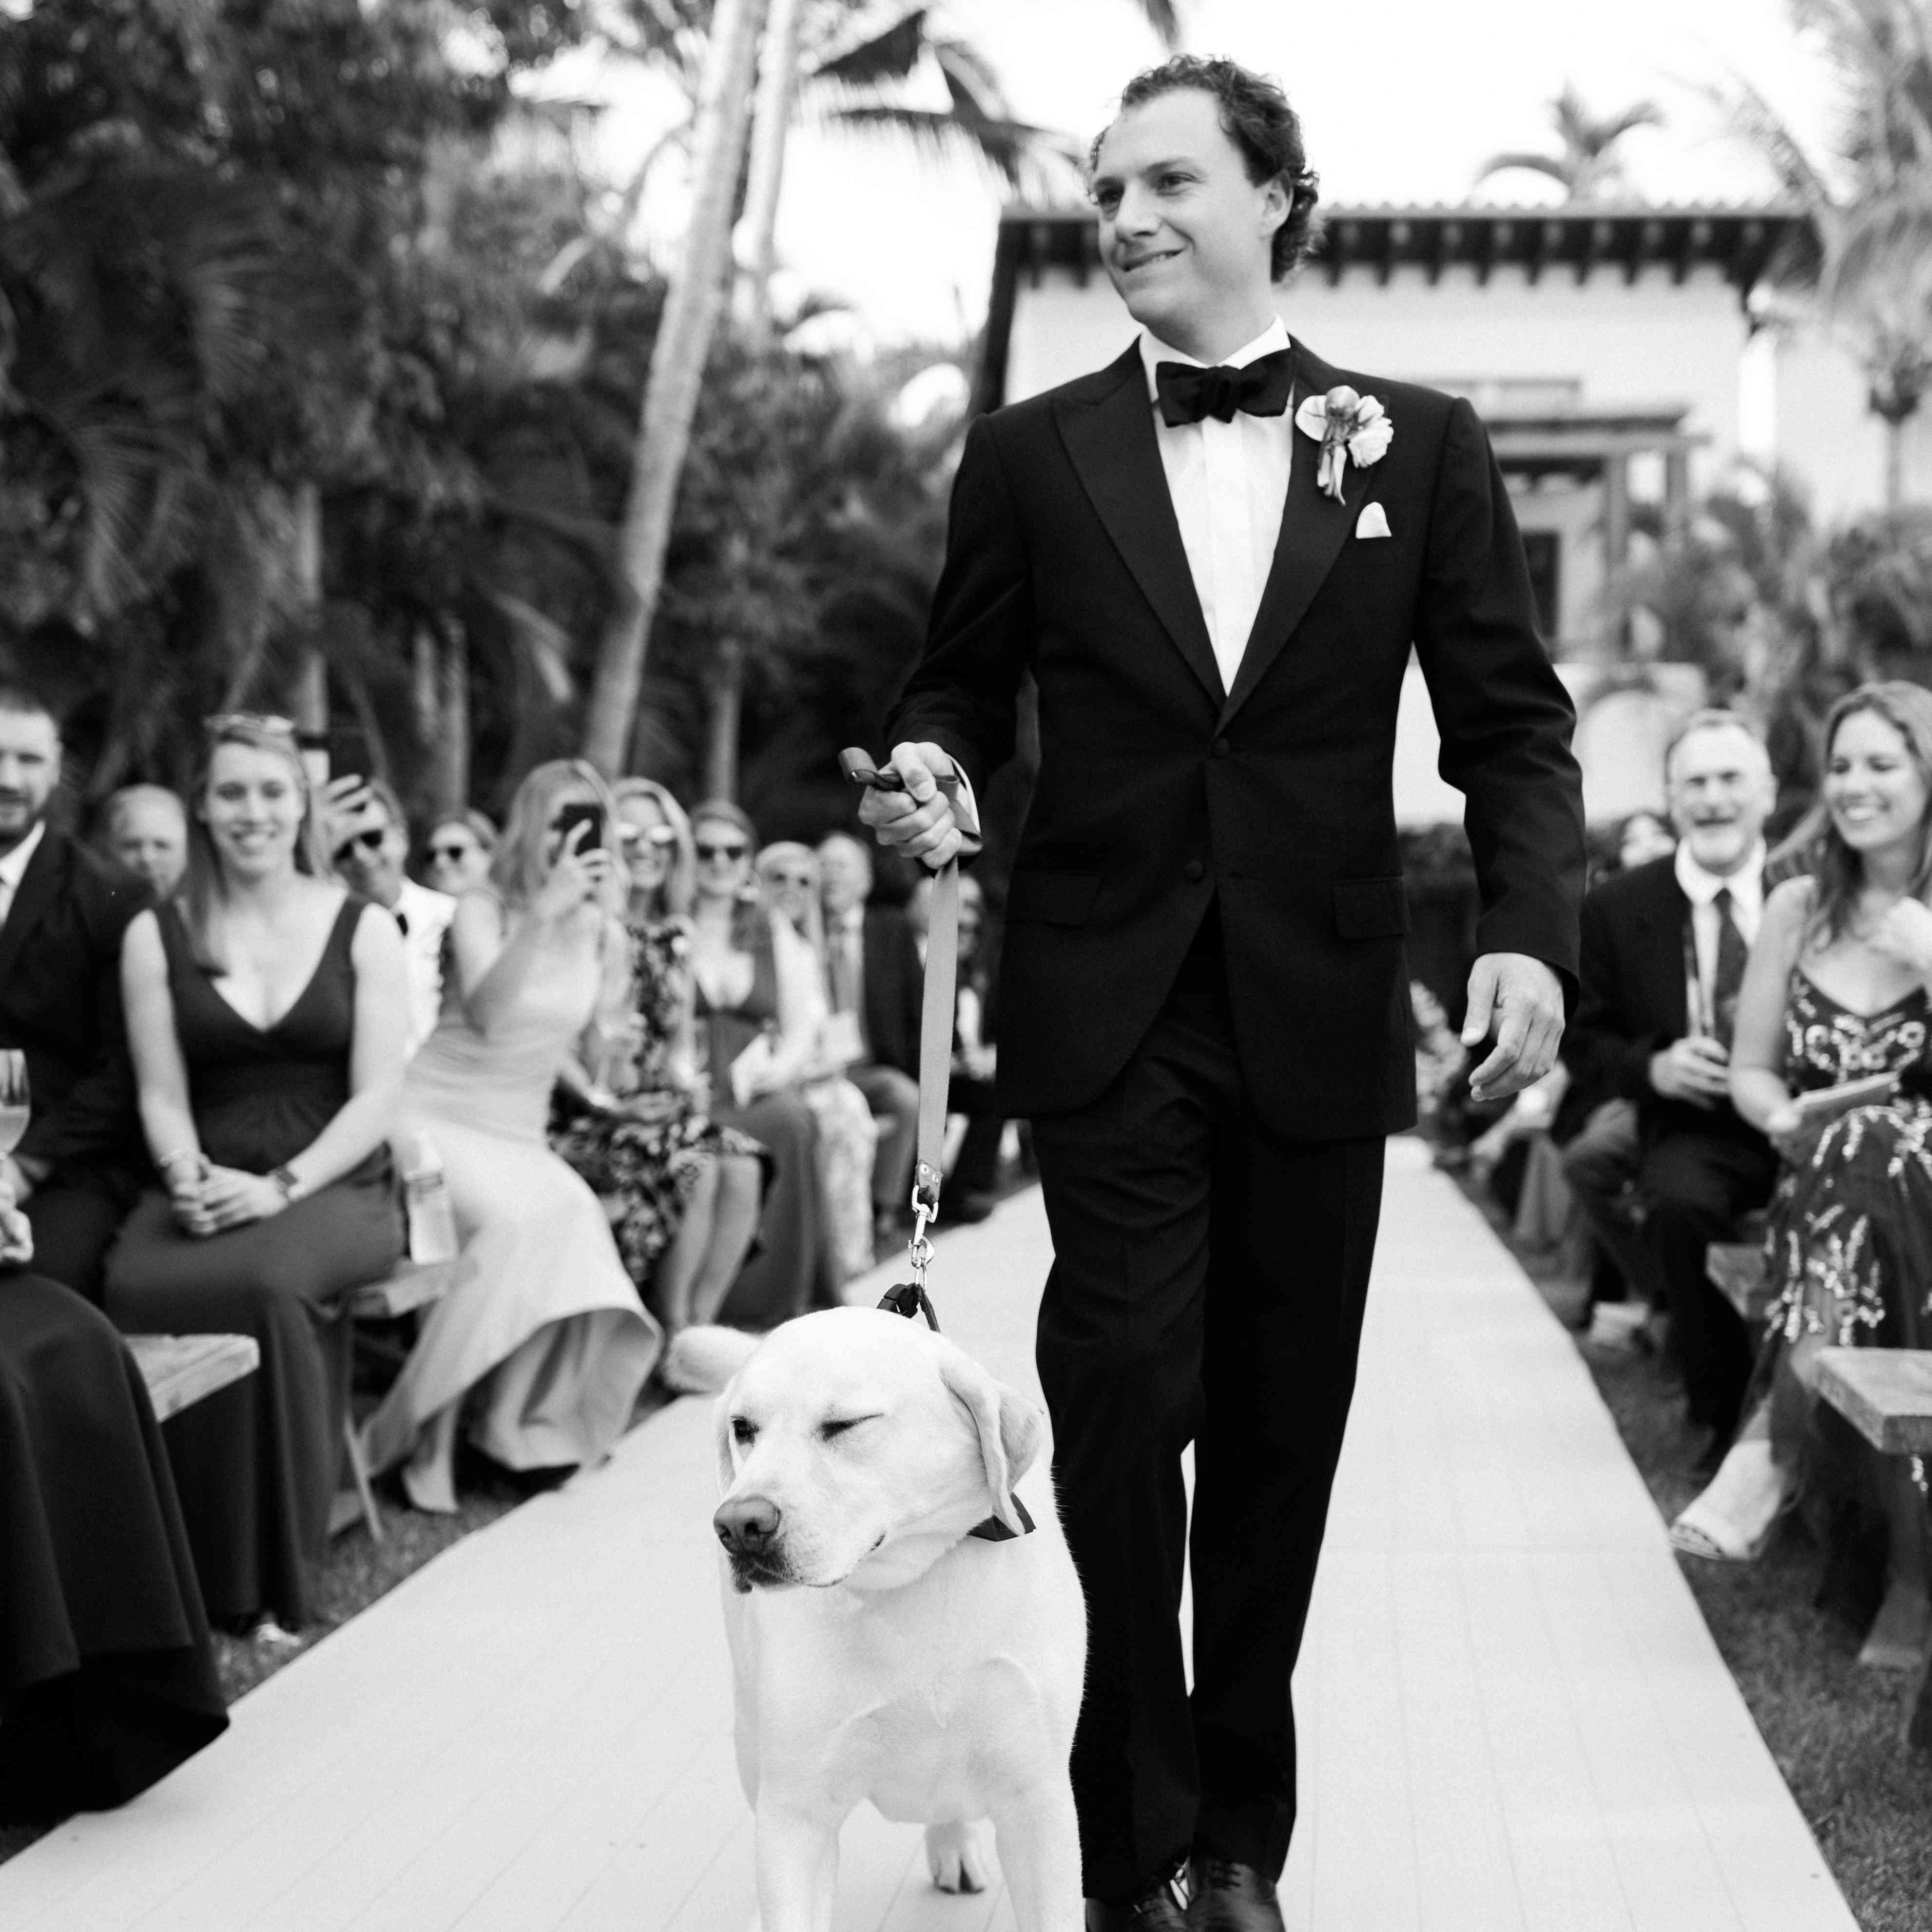 Henry the dog walks up the aisle